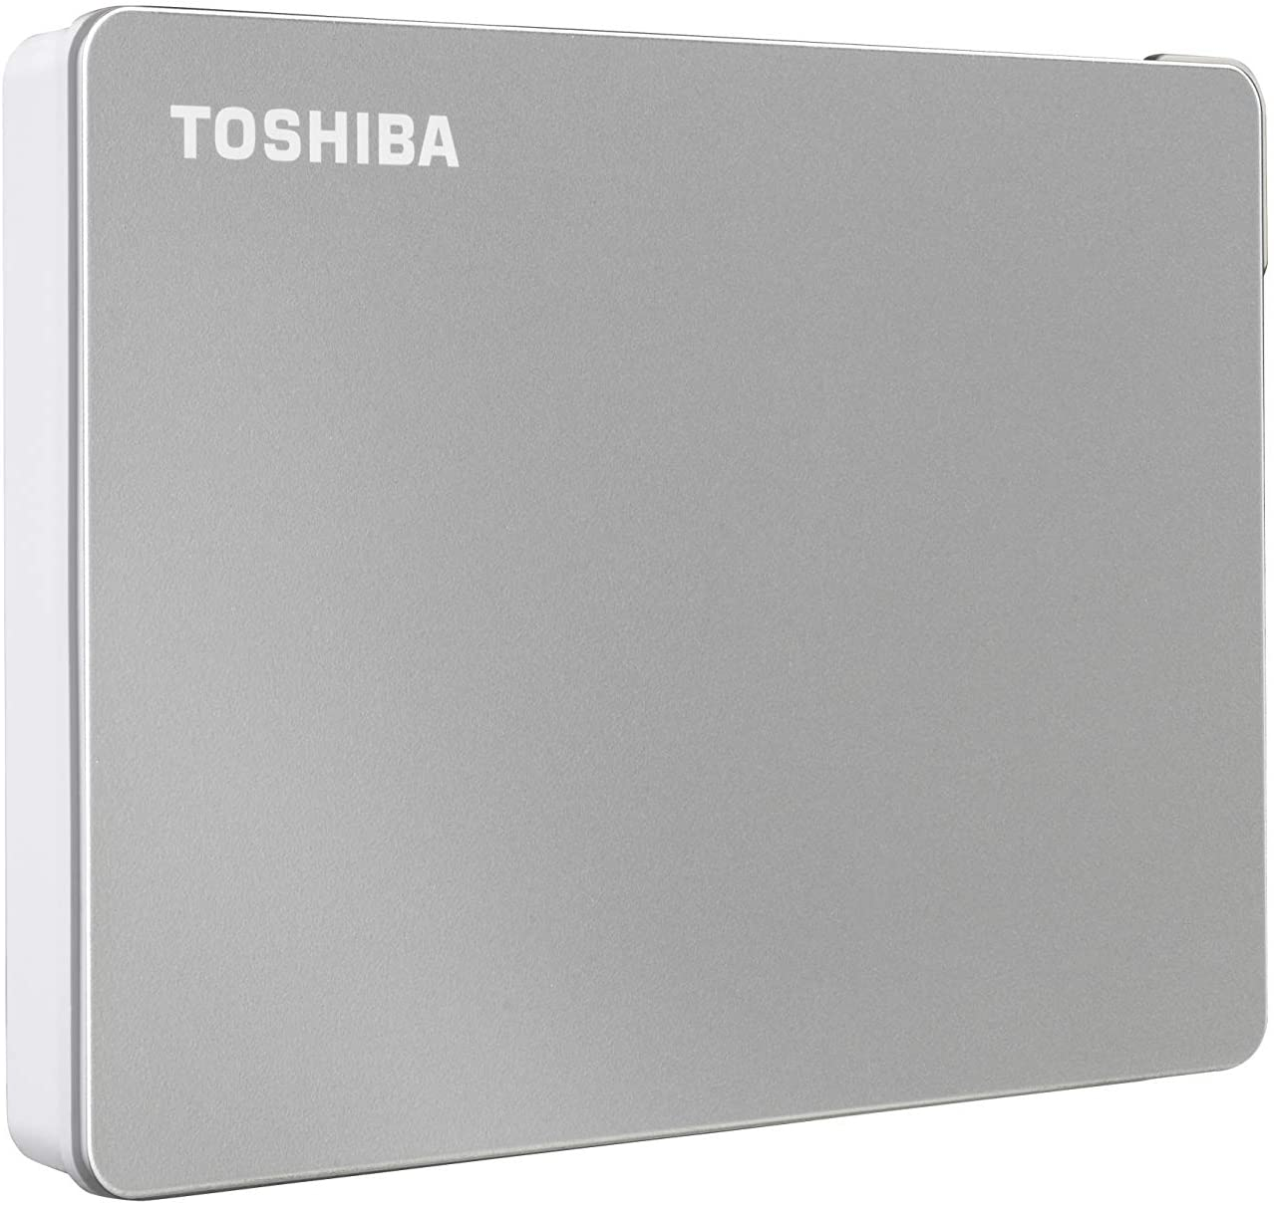 Toshiba Canvio Flex 2TB Portable External Hard Drive USB-C USB 3.0, Silver for PC, Mac, Tablet - HDTX120XSCAA